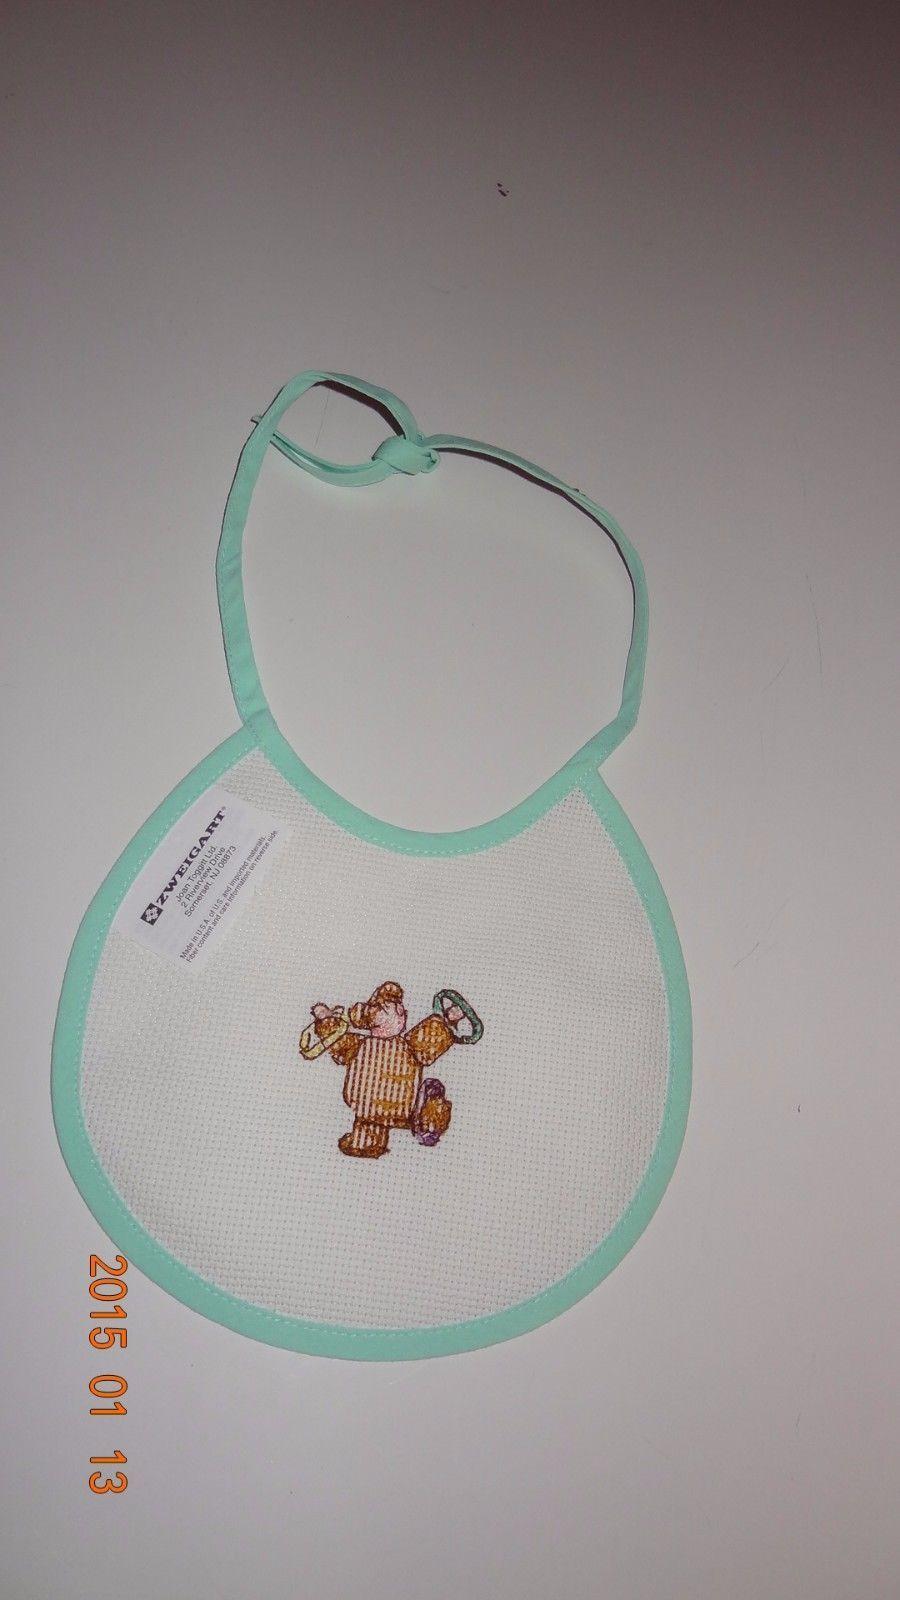 New baby bib boy or girl child wearing Teddy Bear costume Handmade Cross Stitch